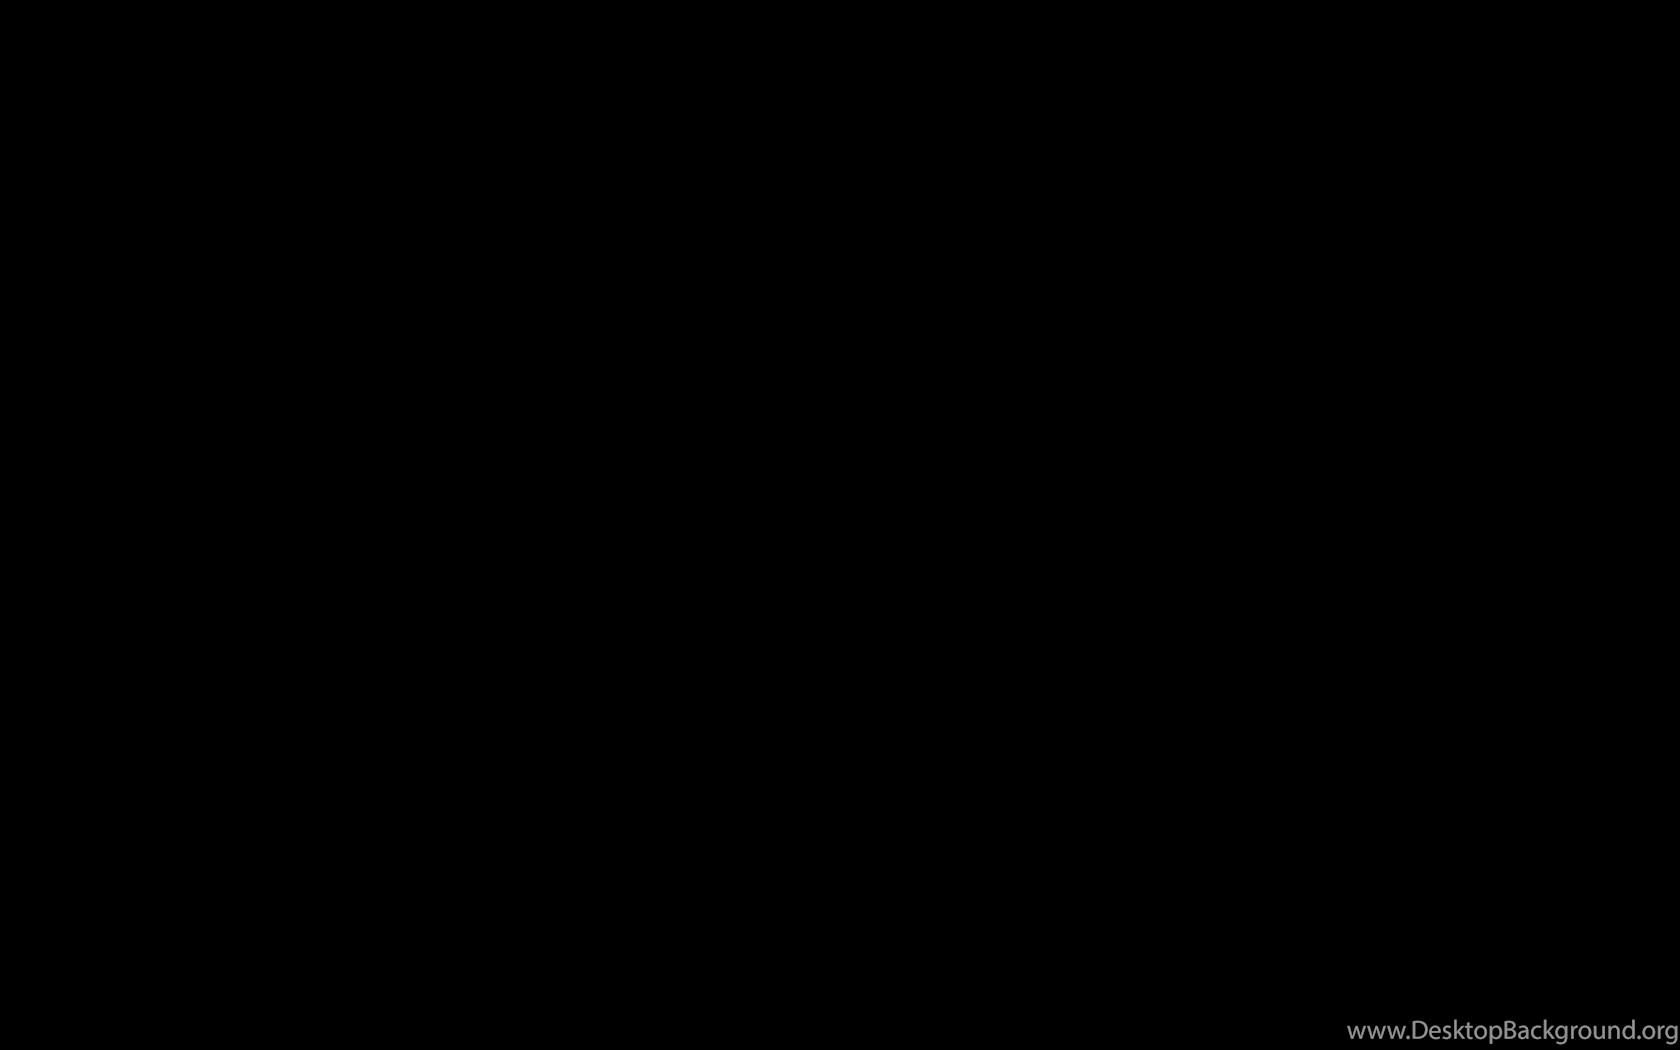 2560x1080 21:9 tv anonymous wallpapers hd, desktop backgrounds